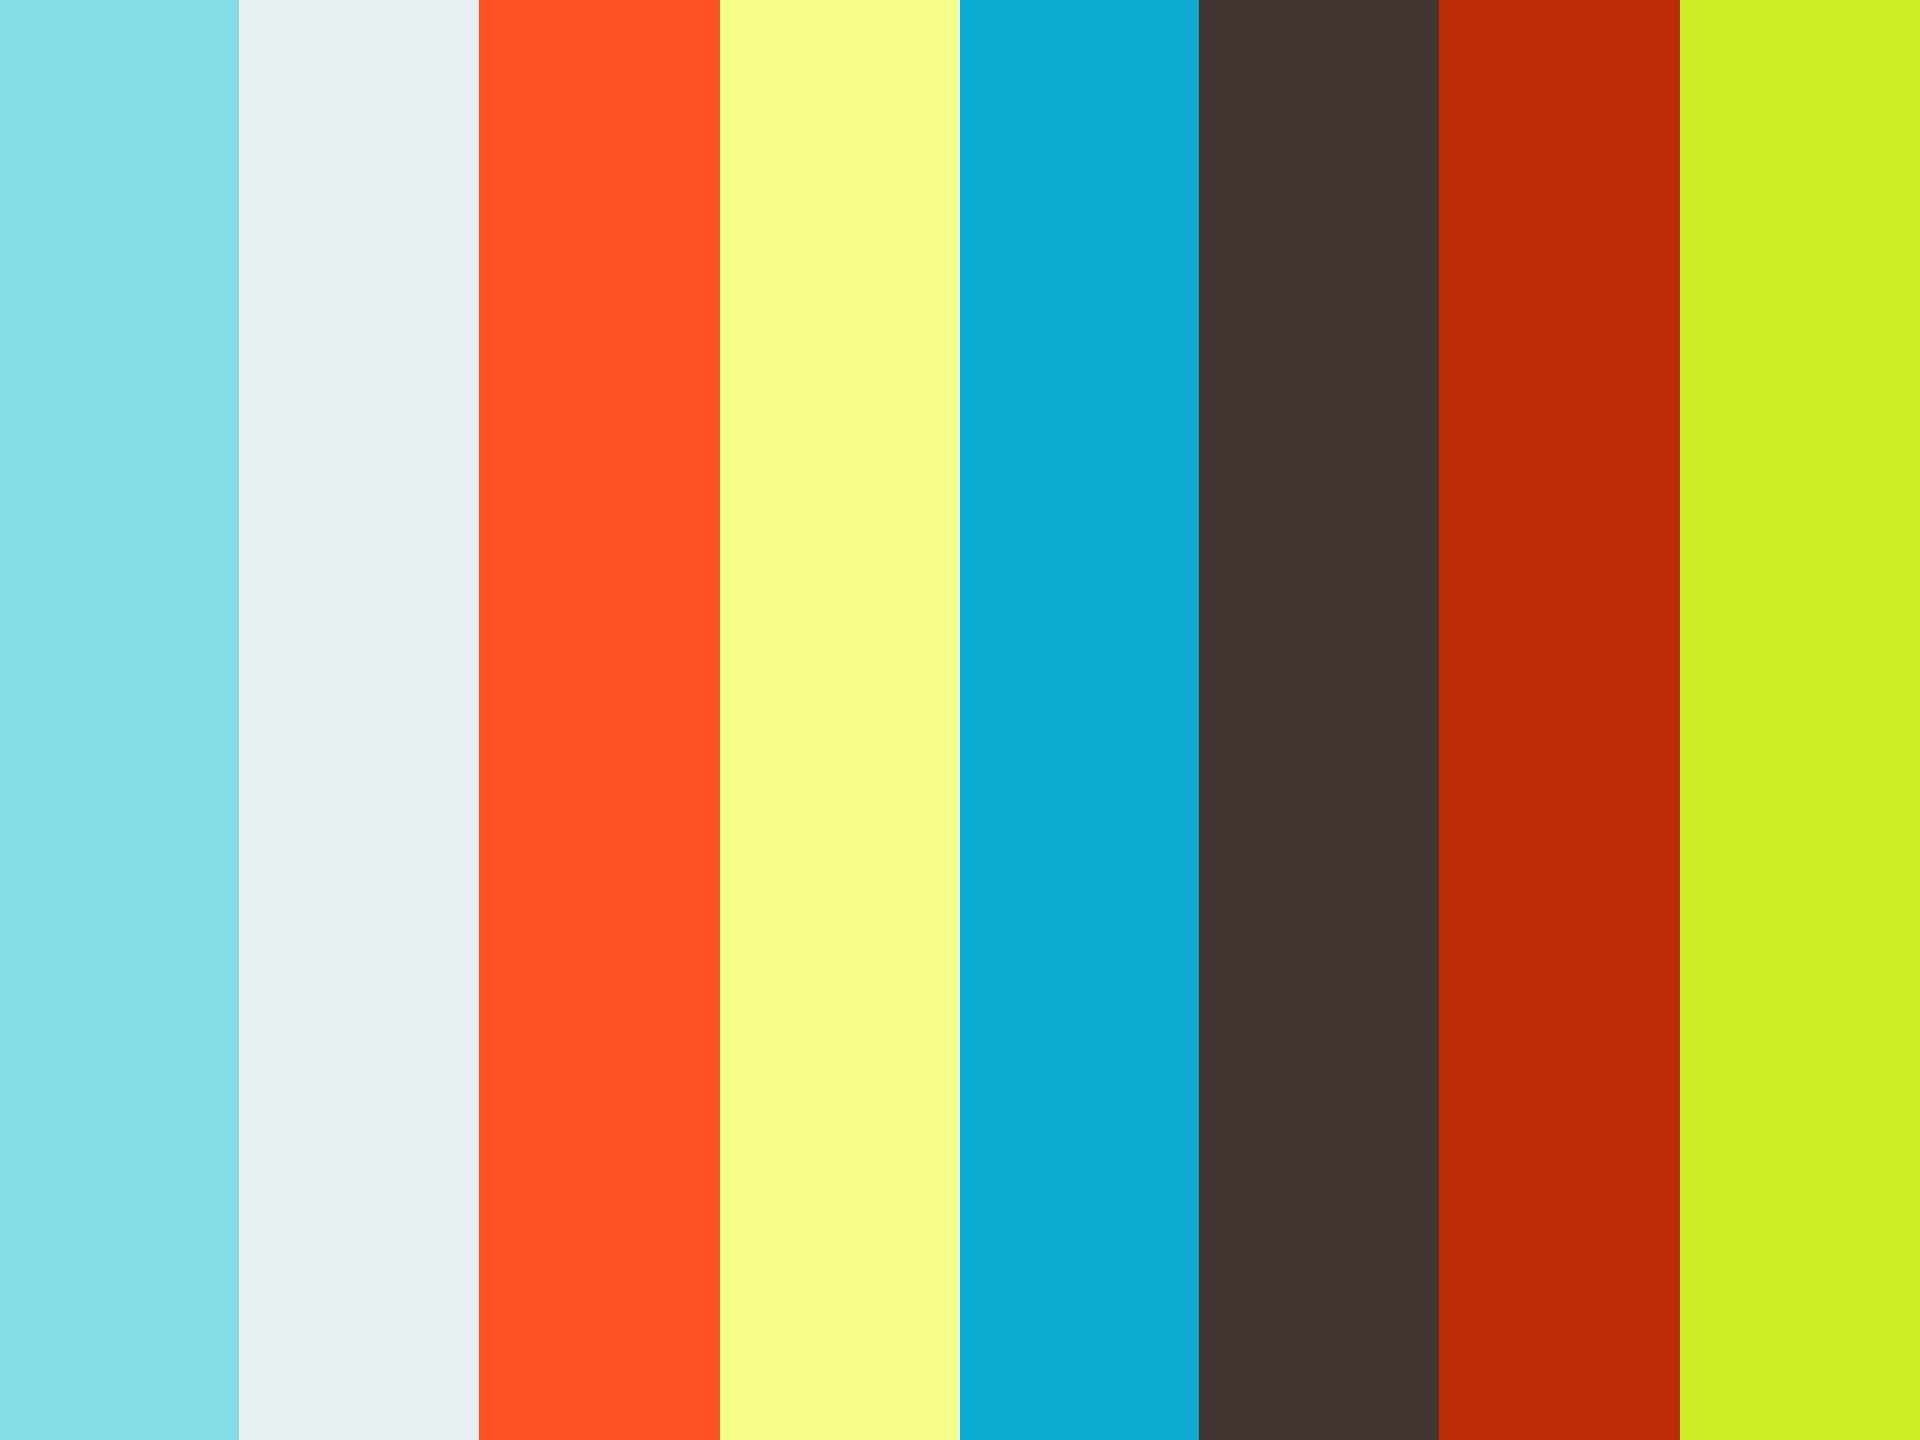 MERCEDES BENZ E400 - BLACK - 2017